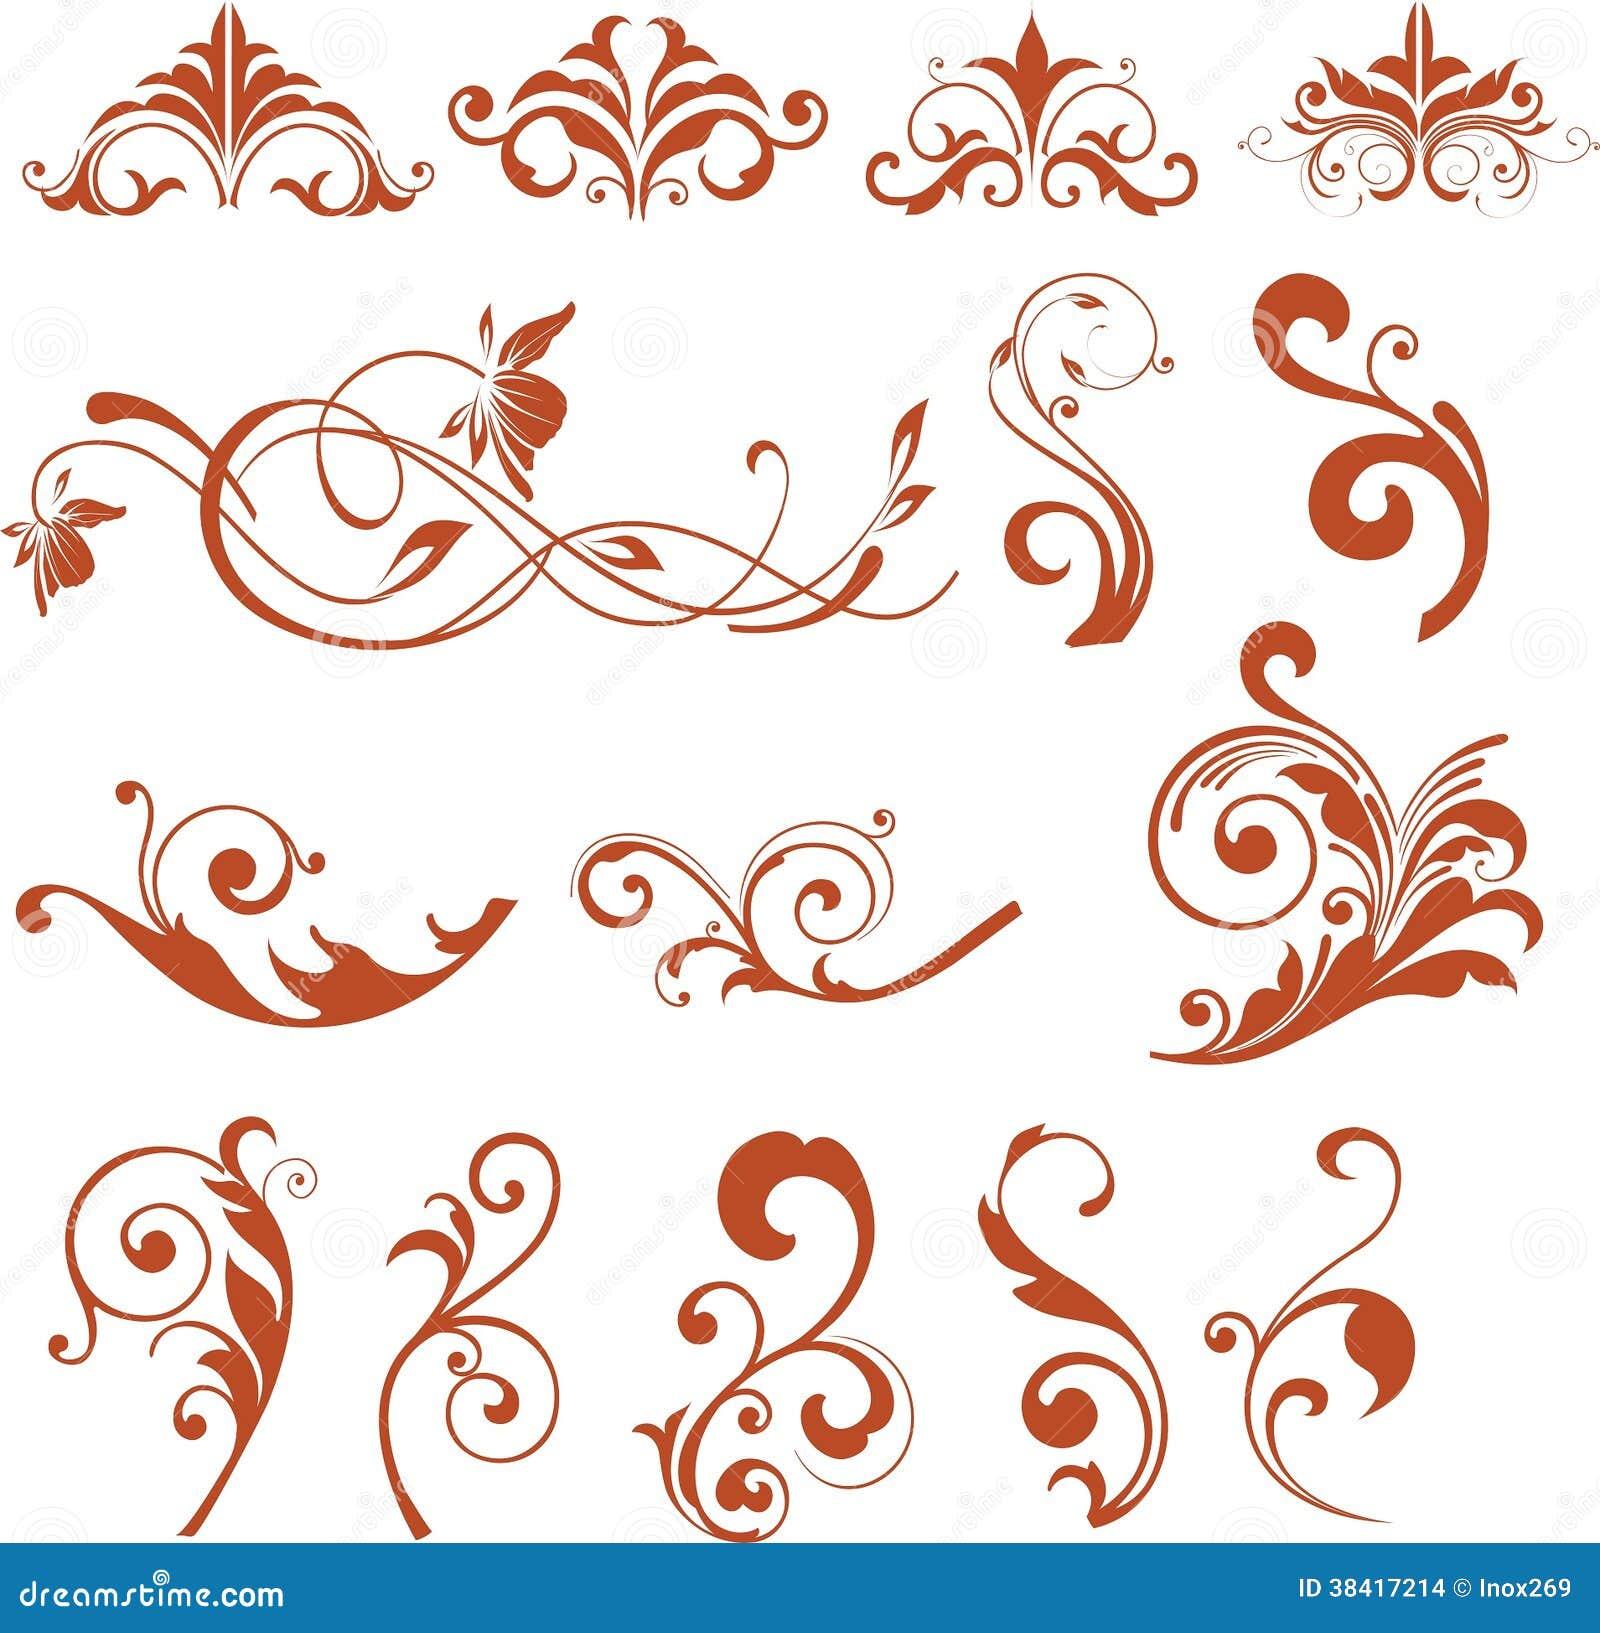 Floral design elements vector flower icons stock images for Decoration elements